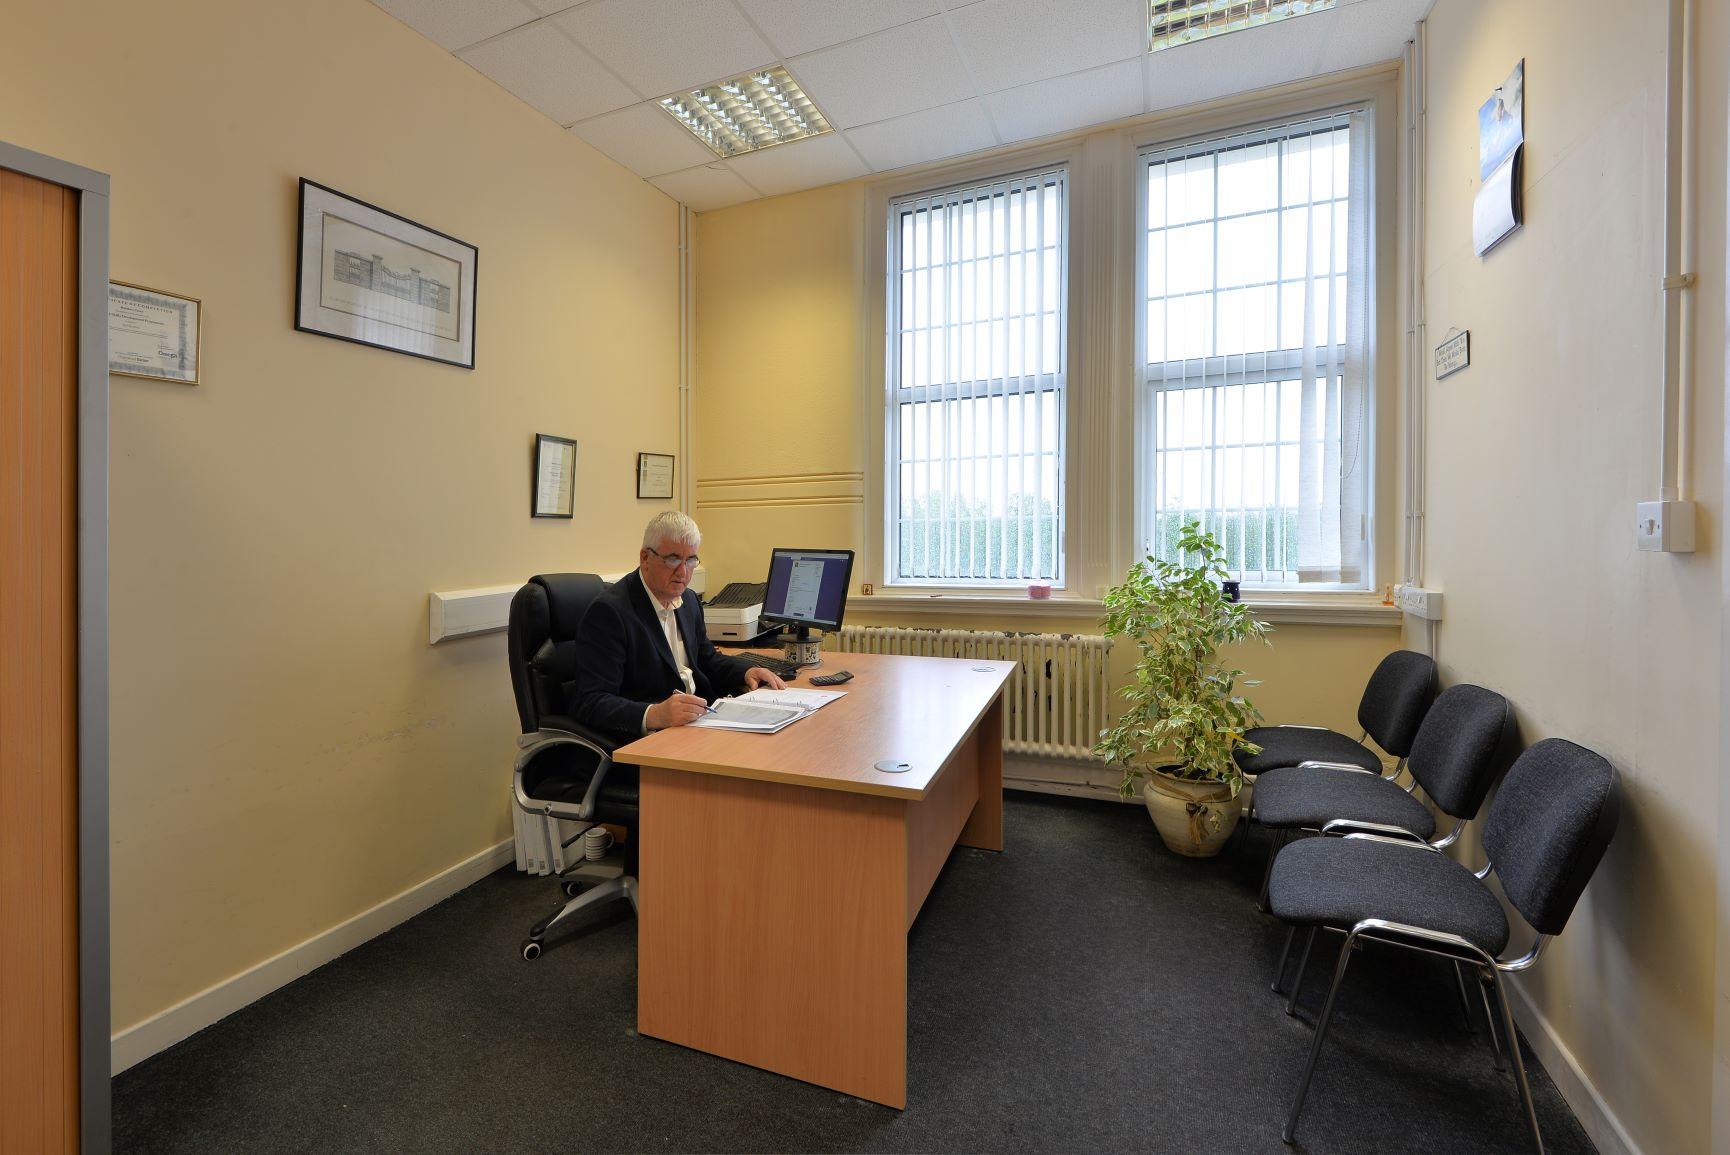 Ballinasloe Enterprise Centre